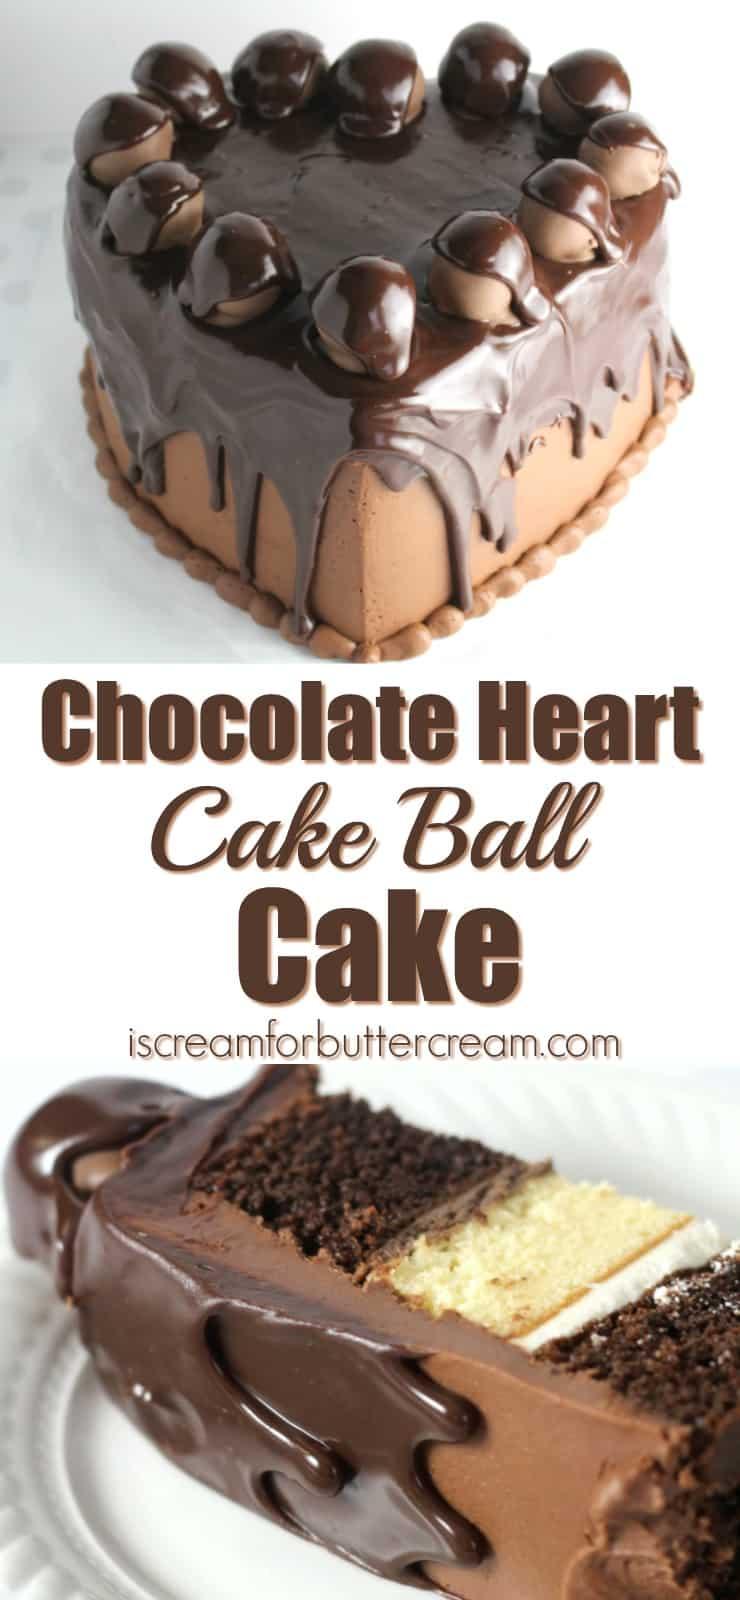 Chocolate Heart Cake Pinterest Graphic